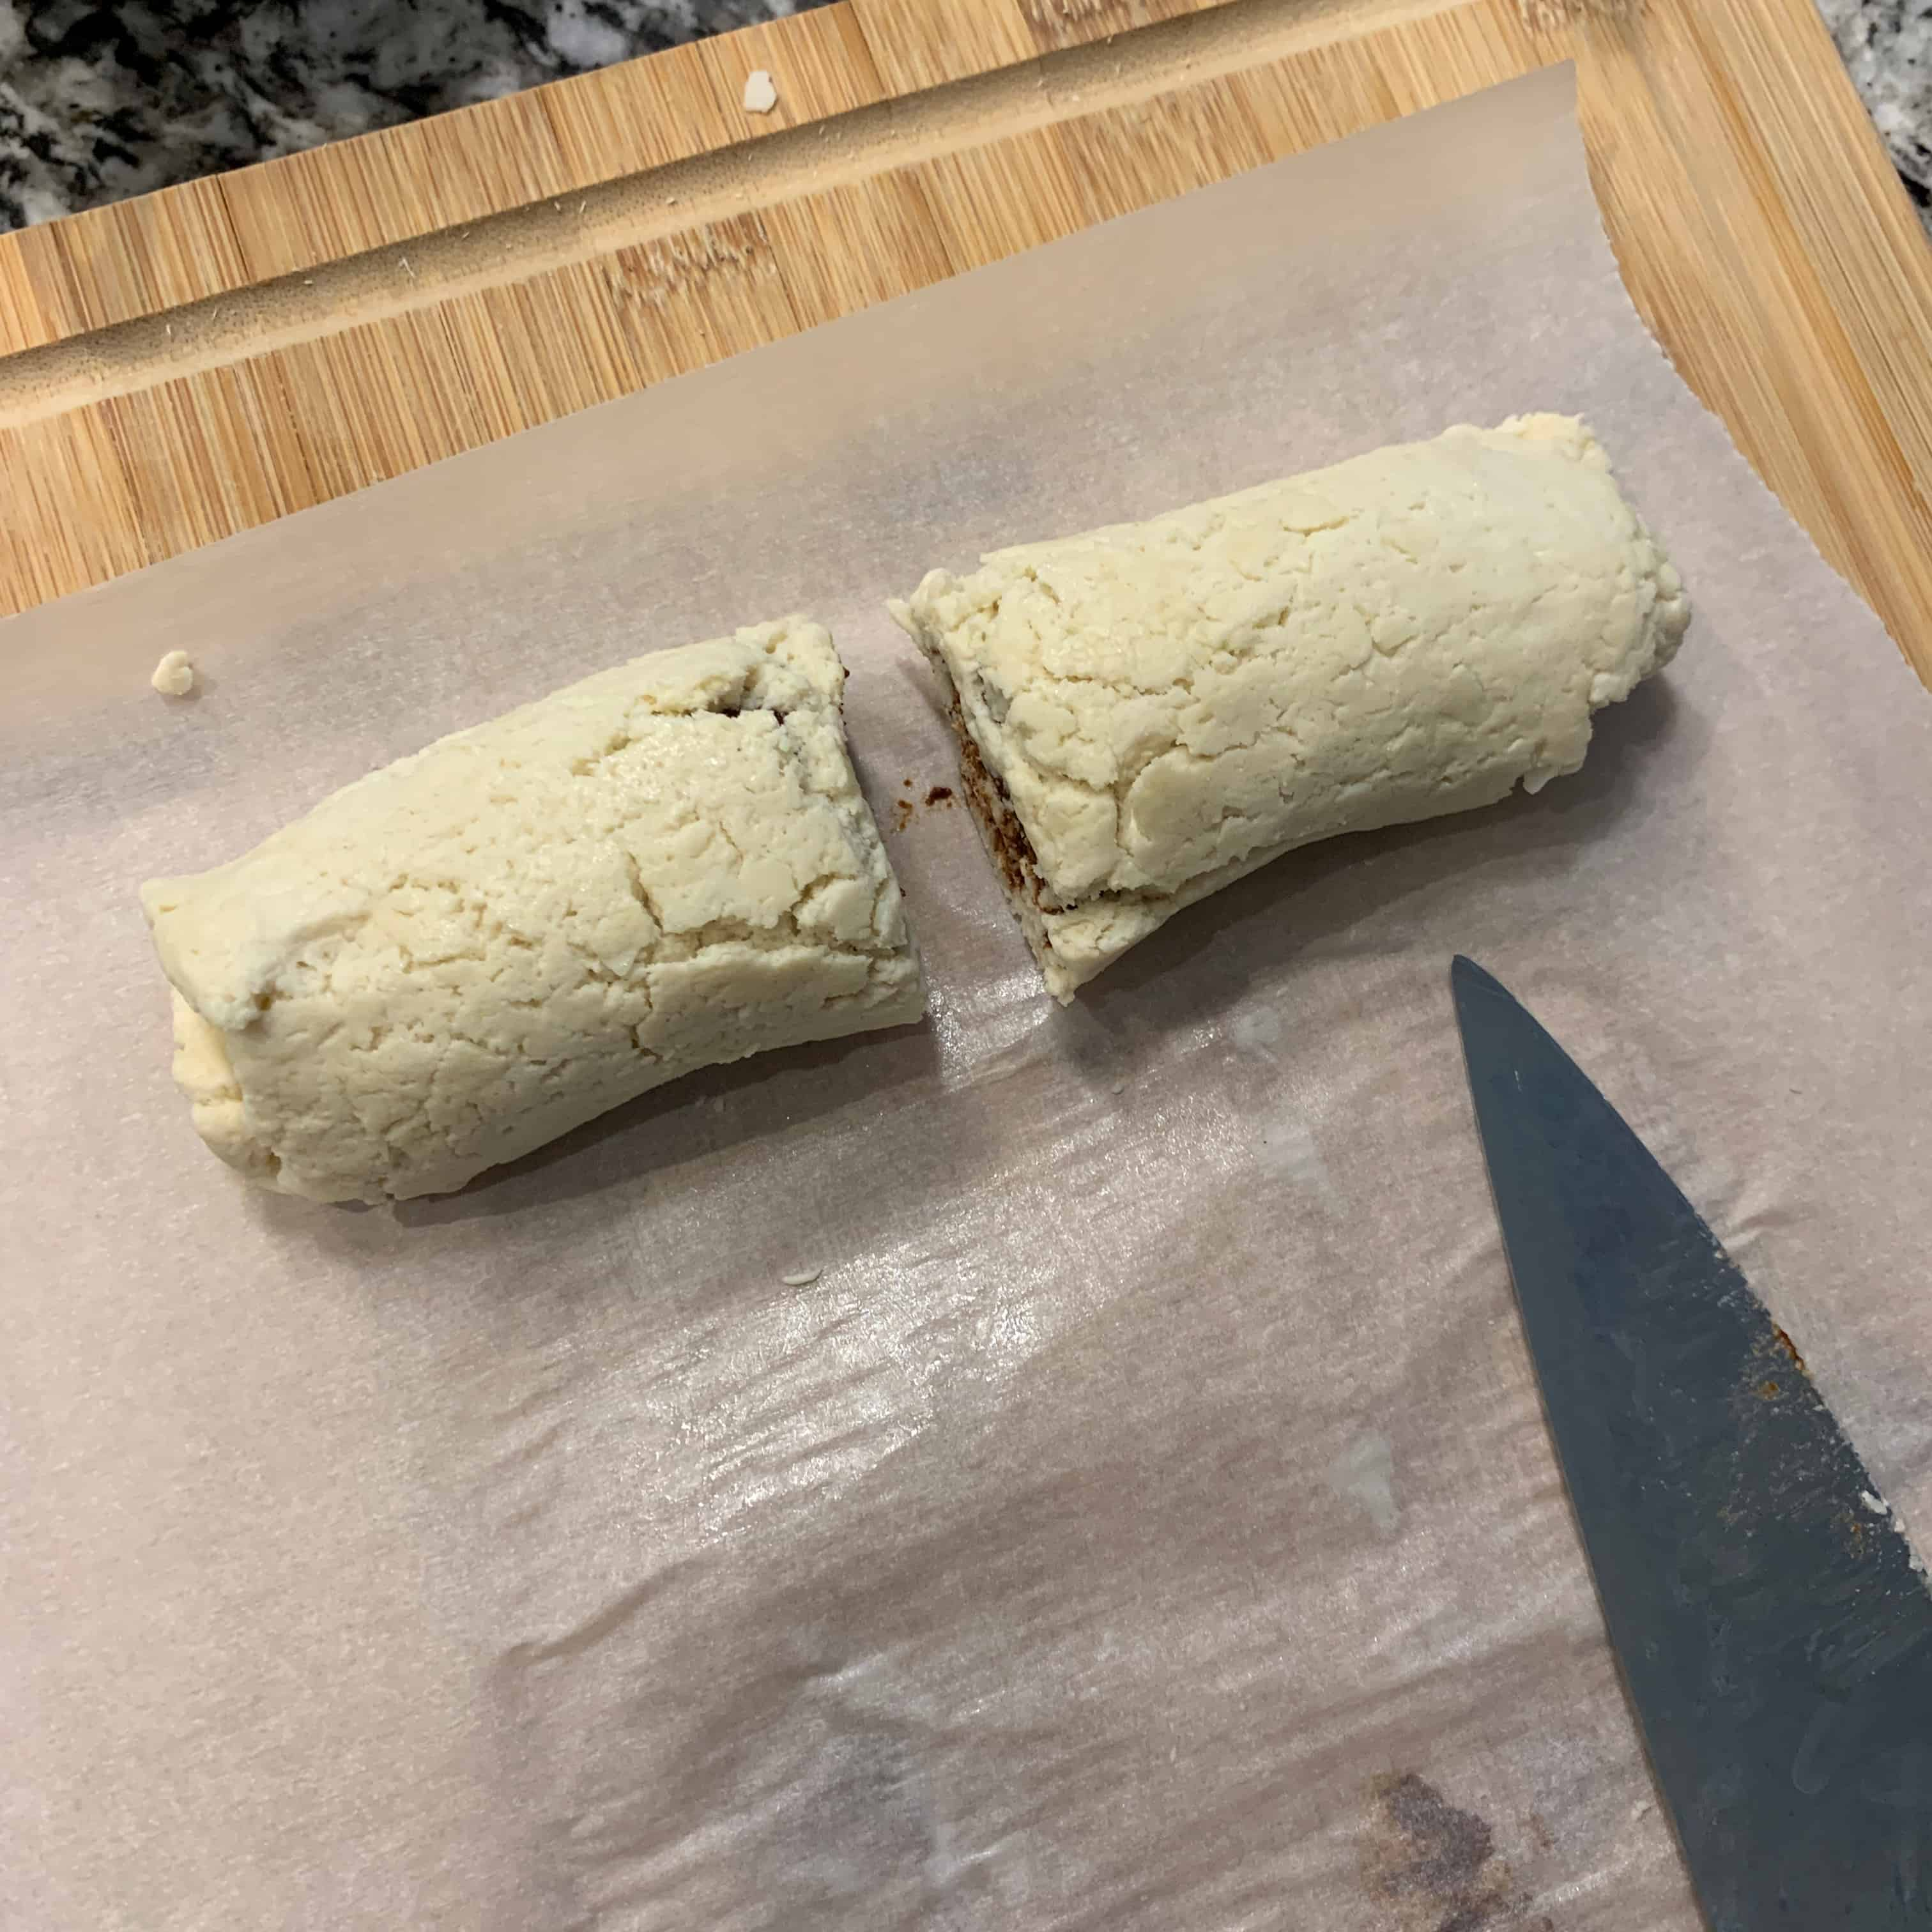 cinnamon roll in a mug dough cut in half before microwaving